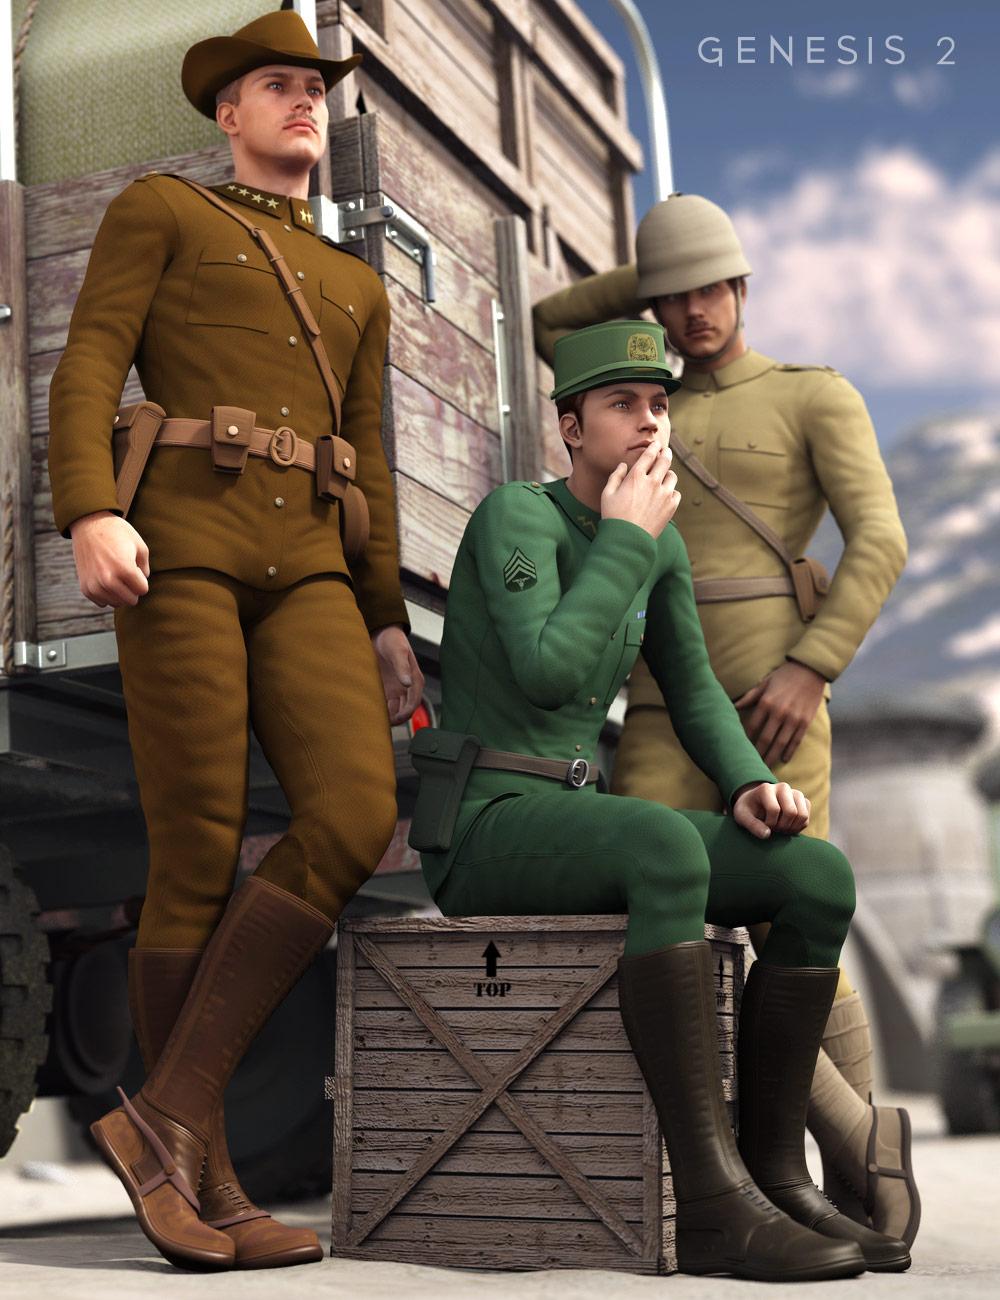 Uniforms for Michael 6 by: Oskarsson, 3D Models by Daz 3D